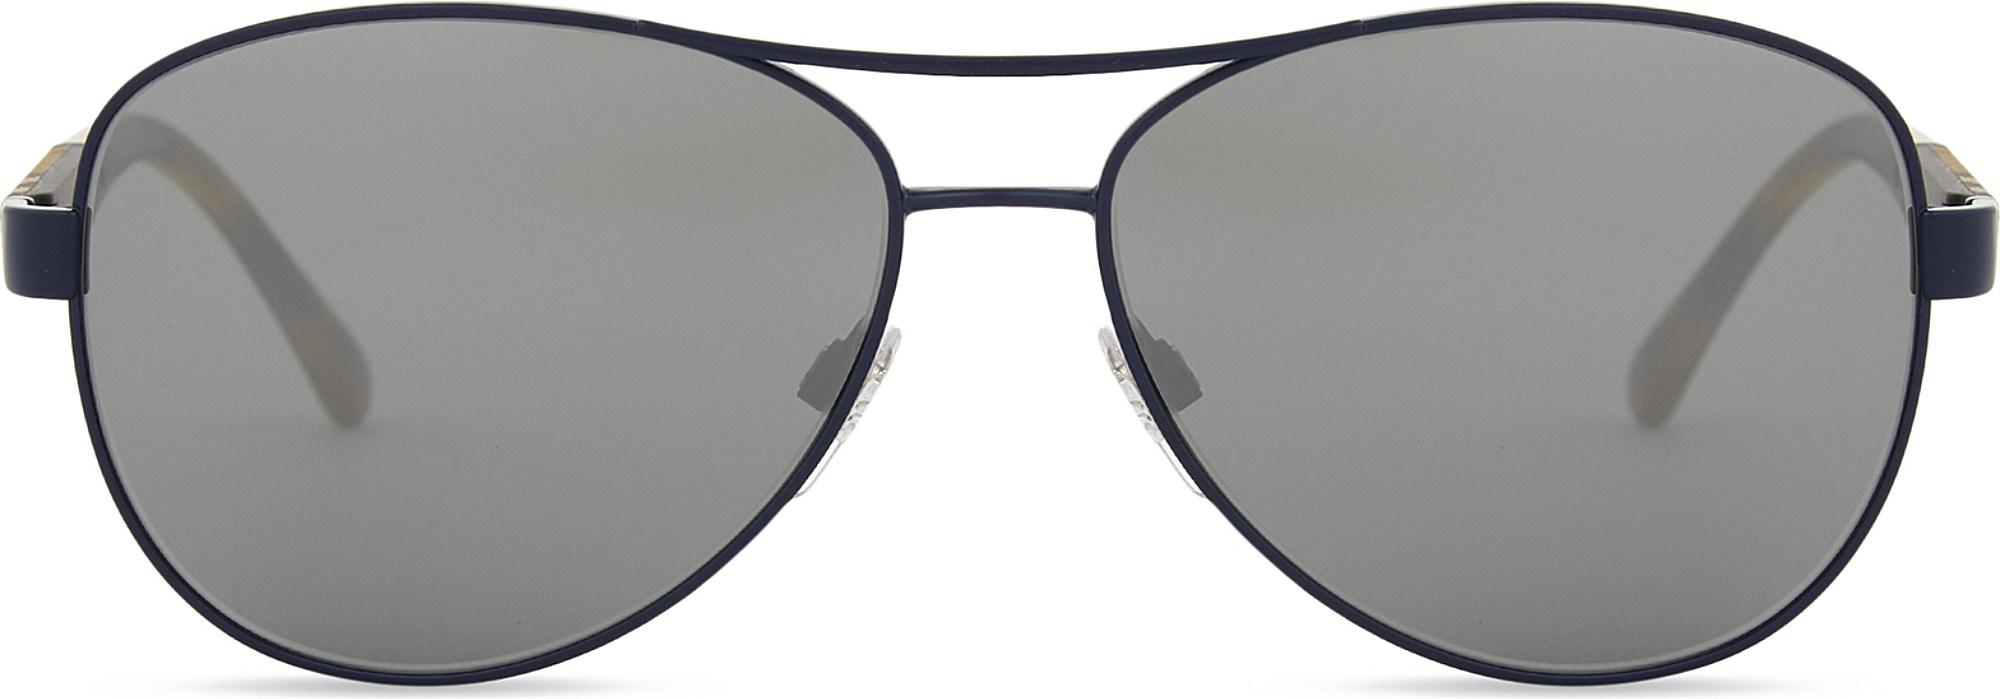 4bd3d50ab0a Burberry. Women s Ladies Matte Blue Check Modern Be3080 Aviator Sunglasses